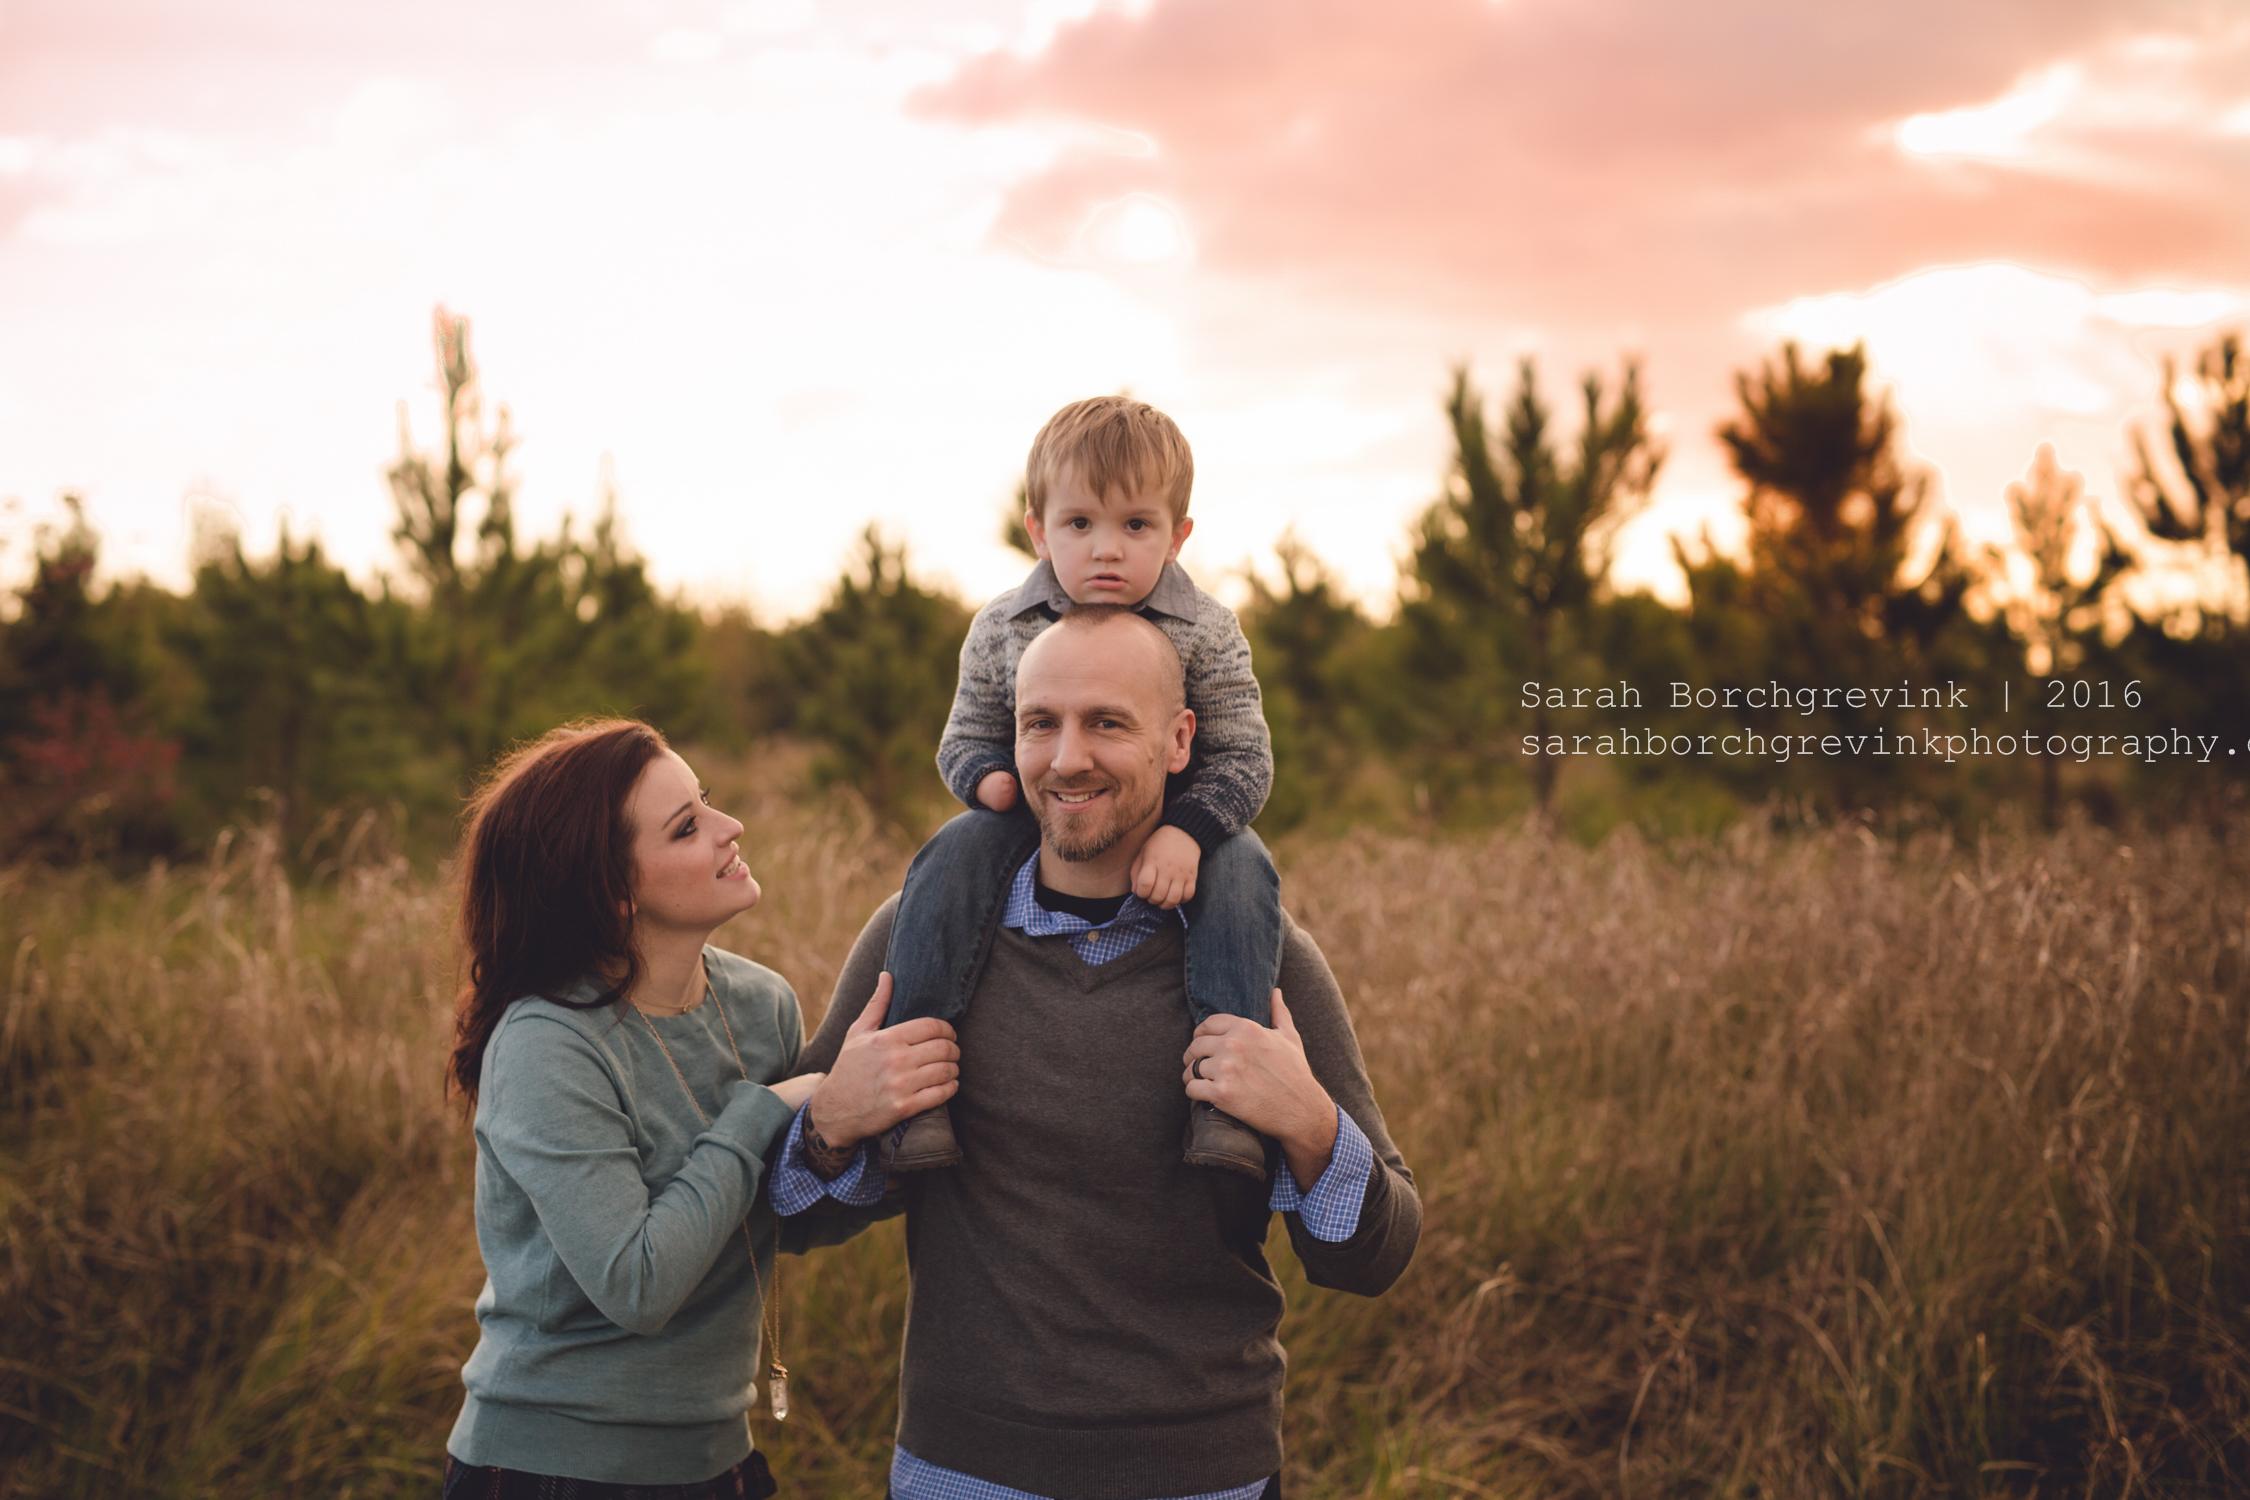 Family Portraits Spring Texas | Sarah Borchgrevink Photography